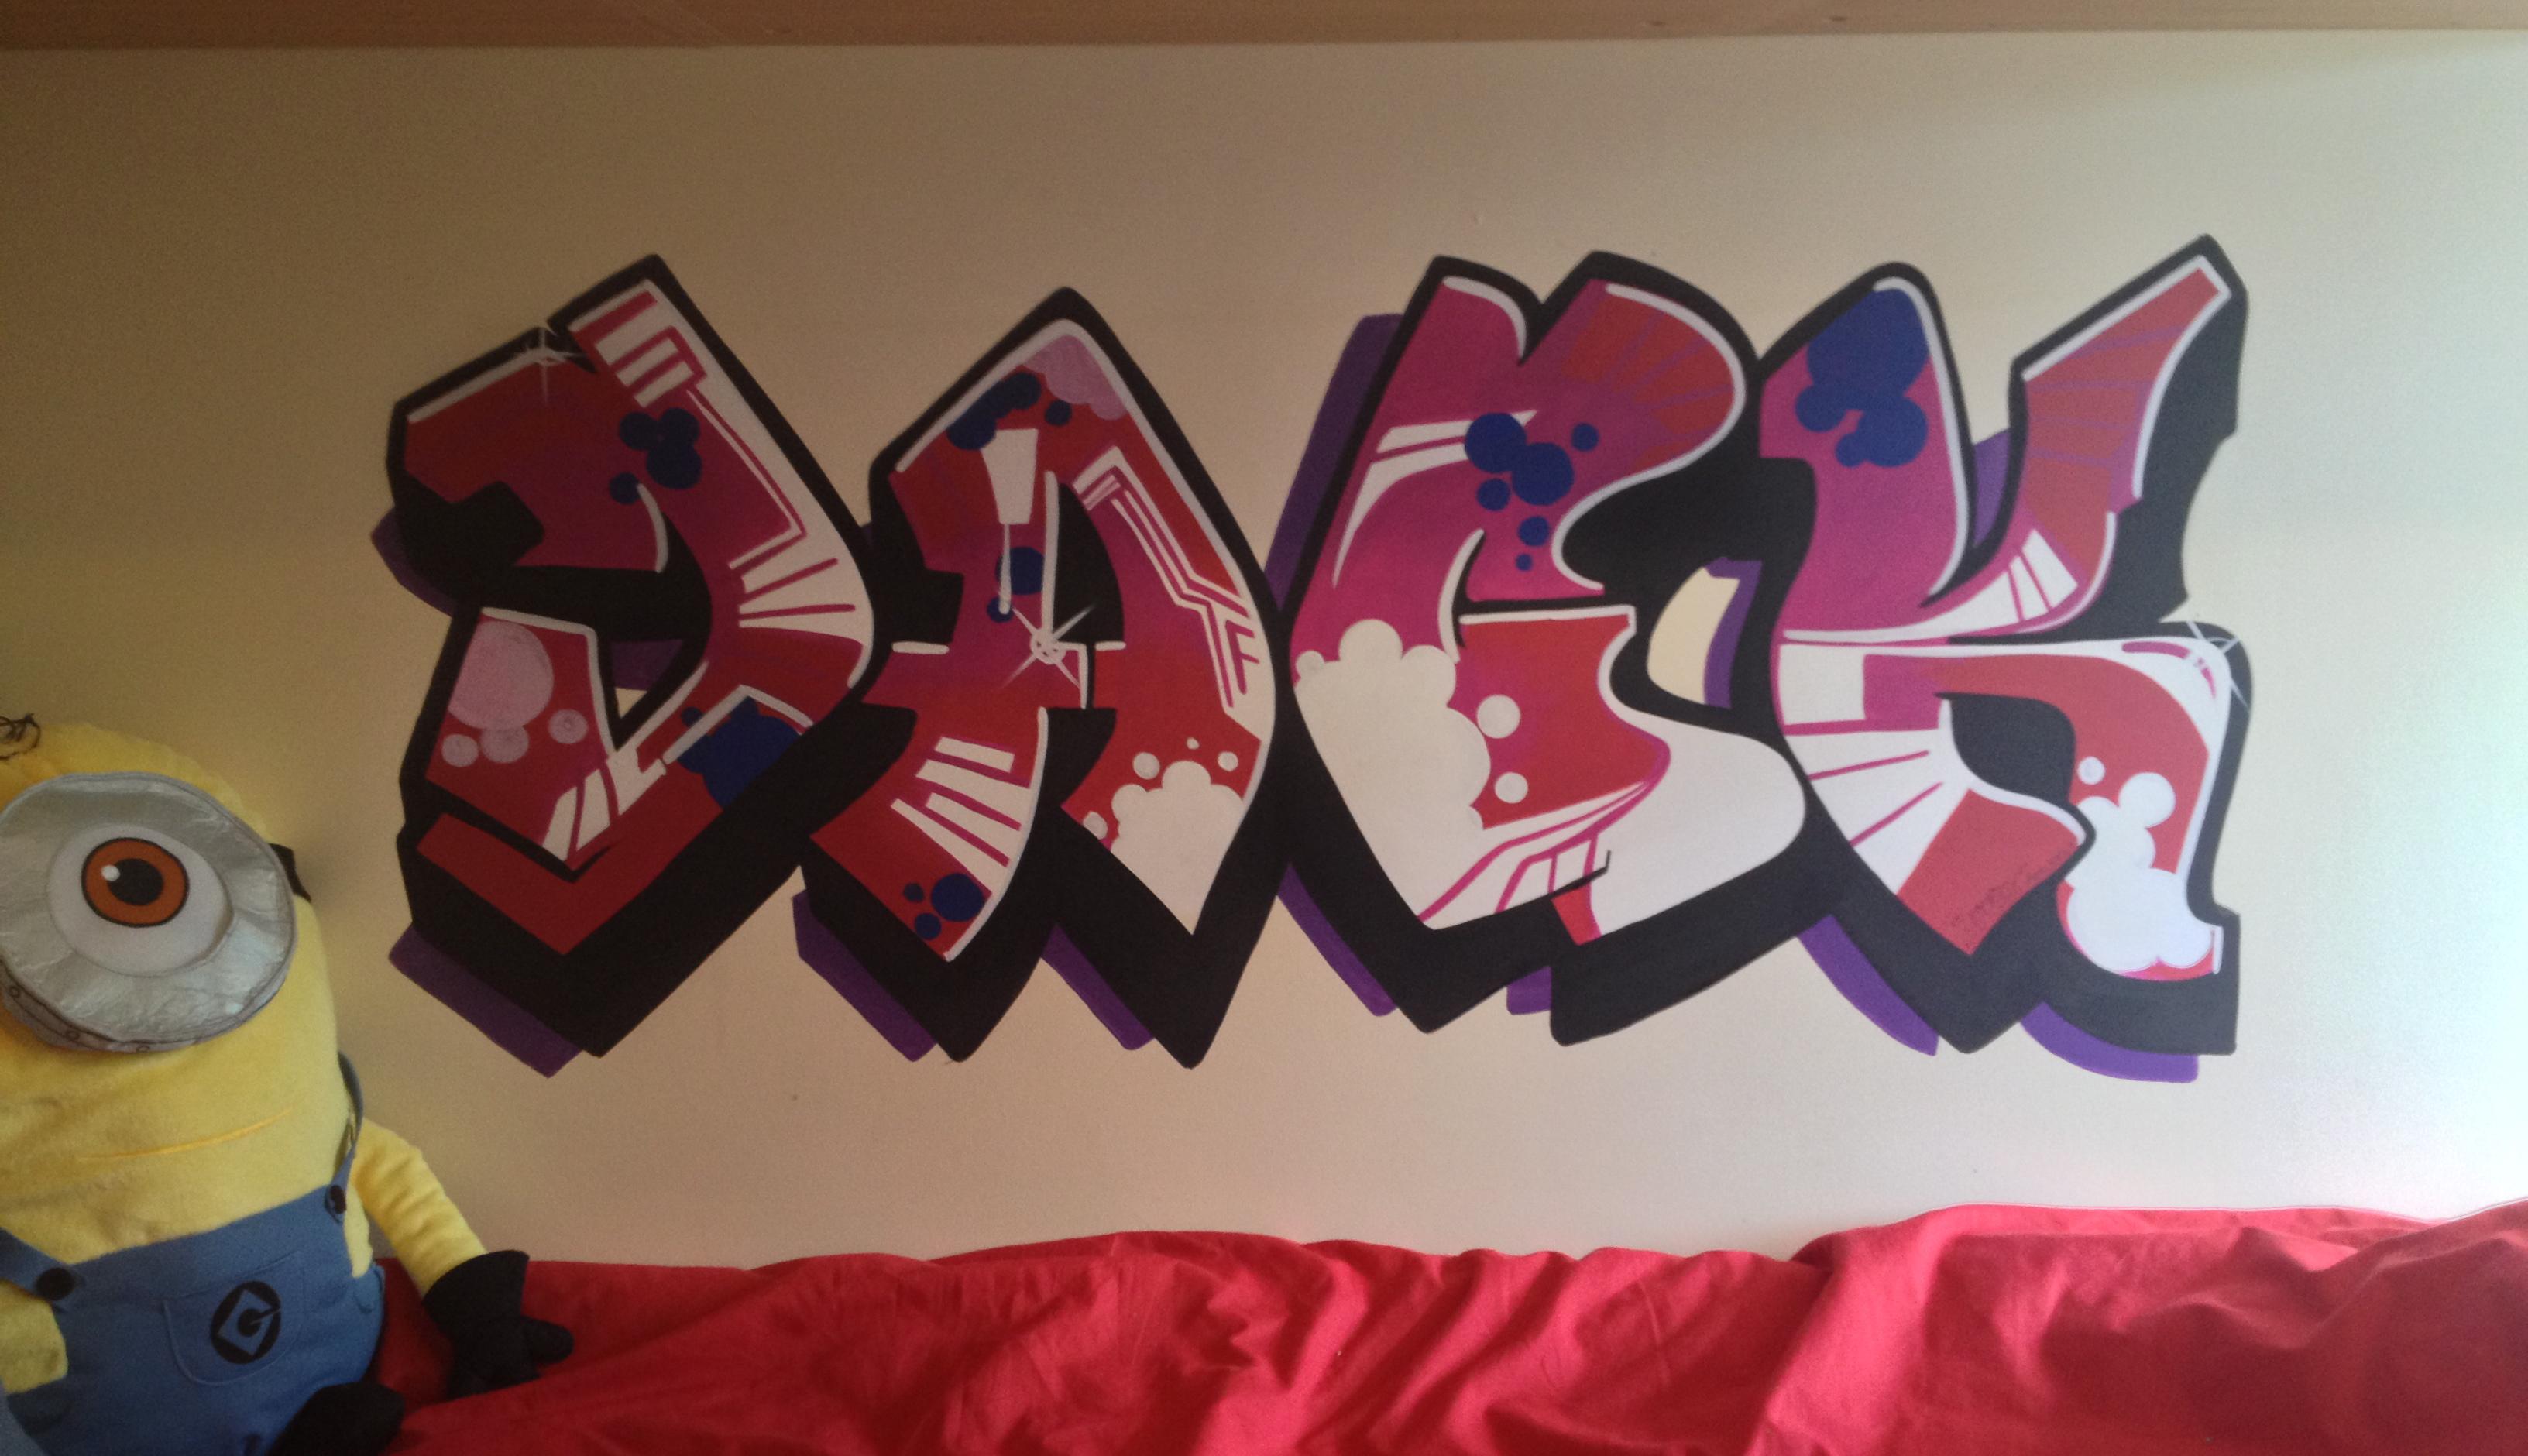 Jack Graffiti